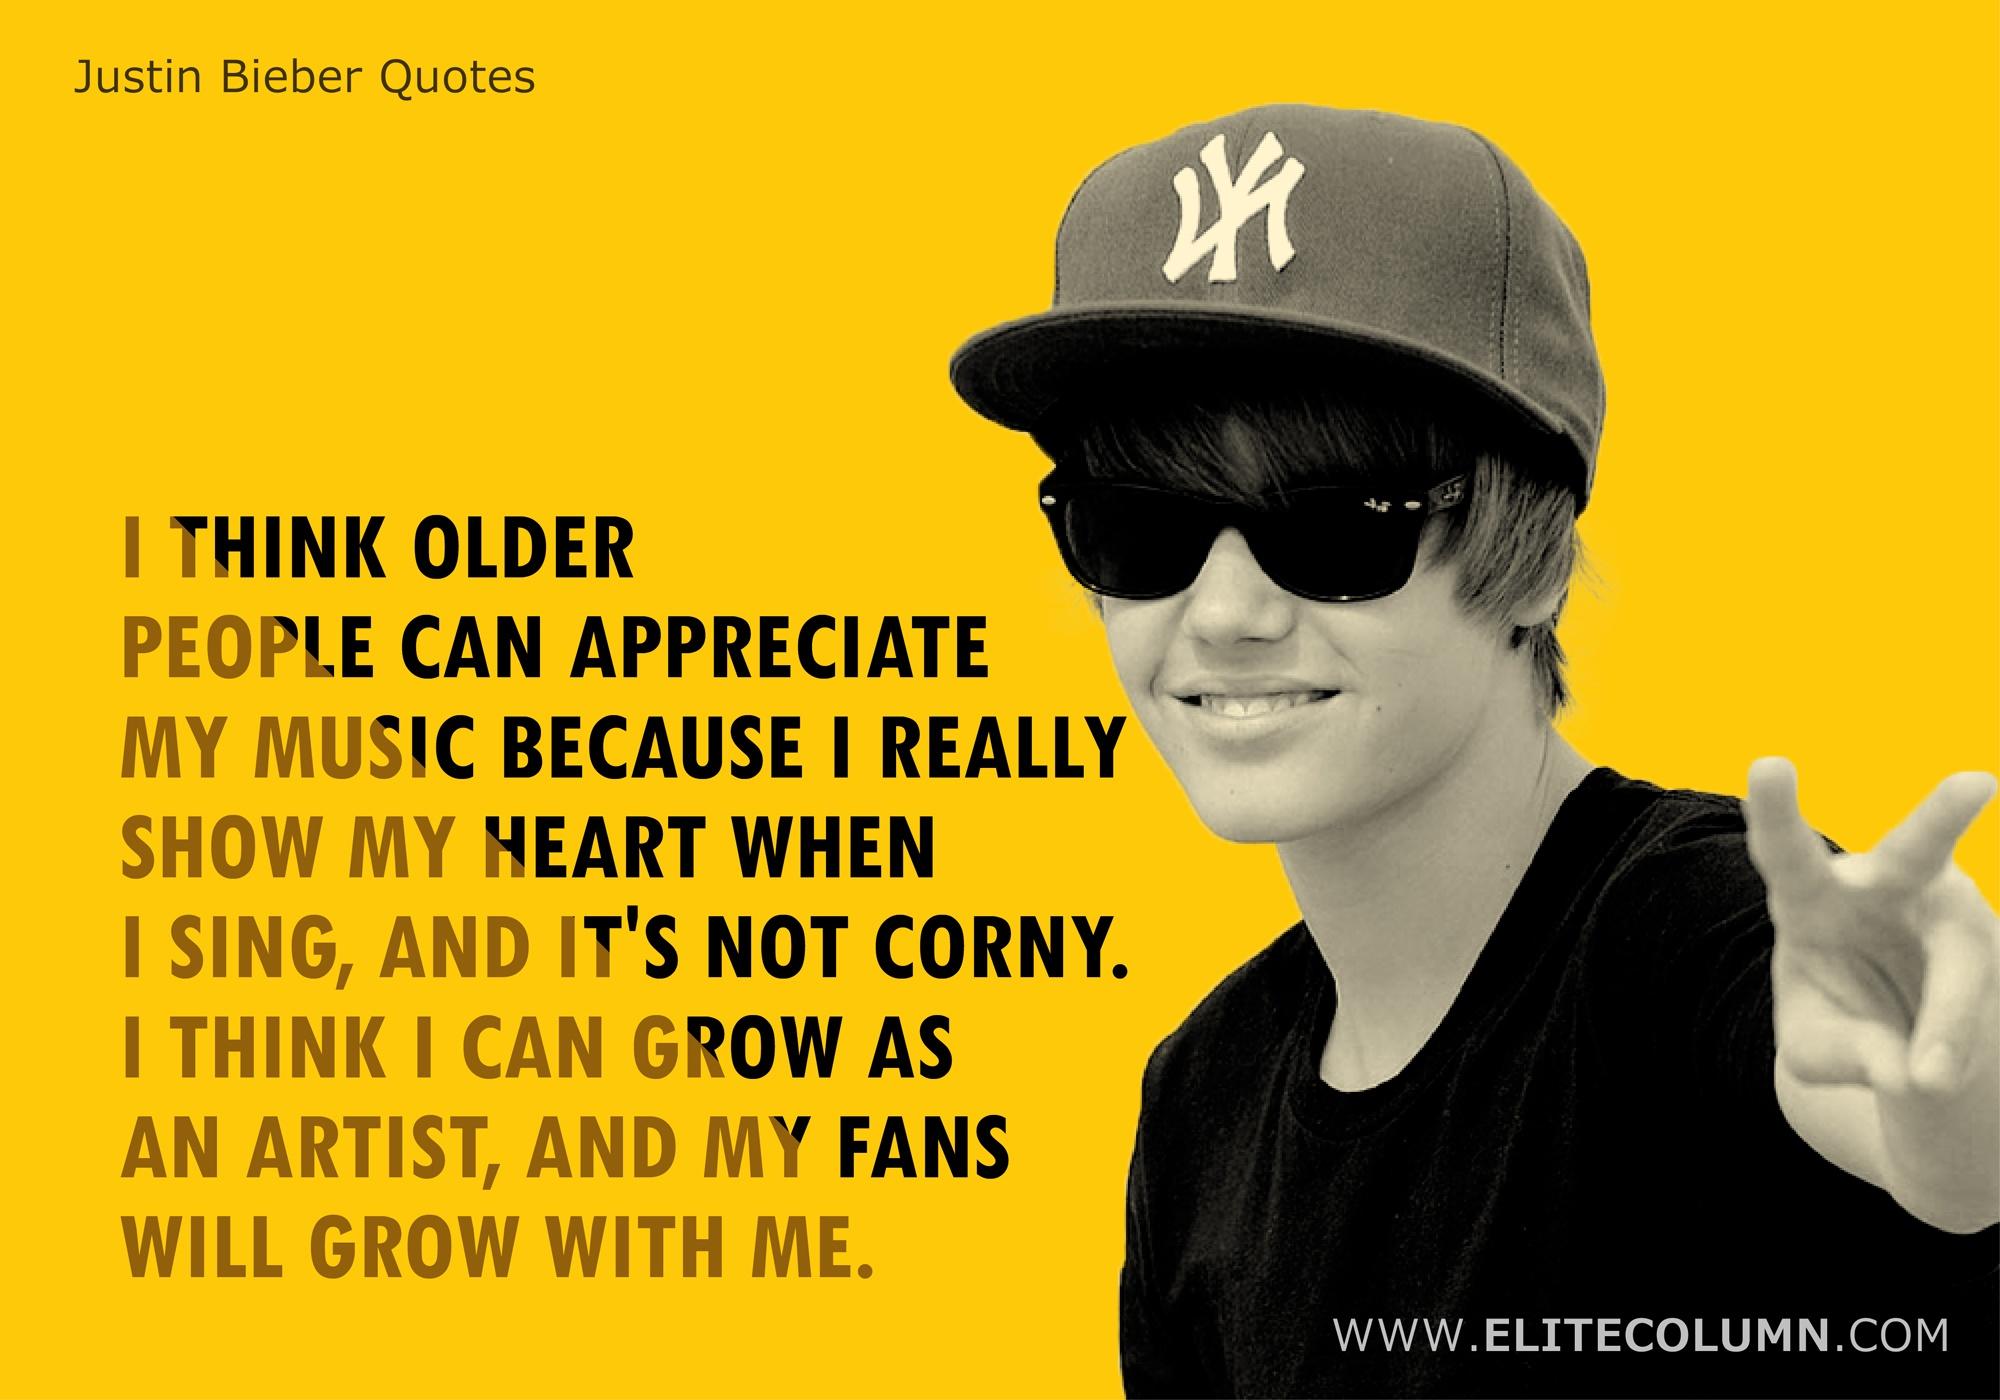 Justin Bieber Quotes (9)